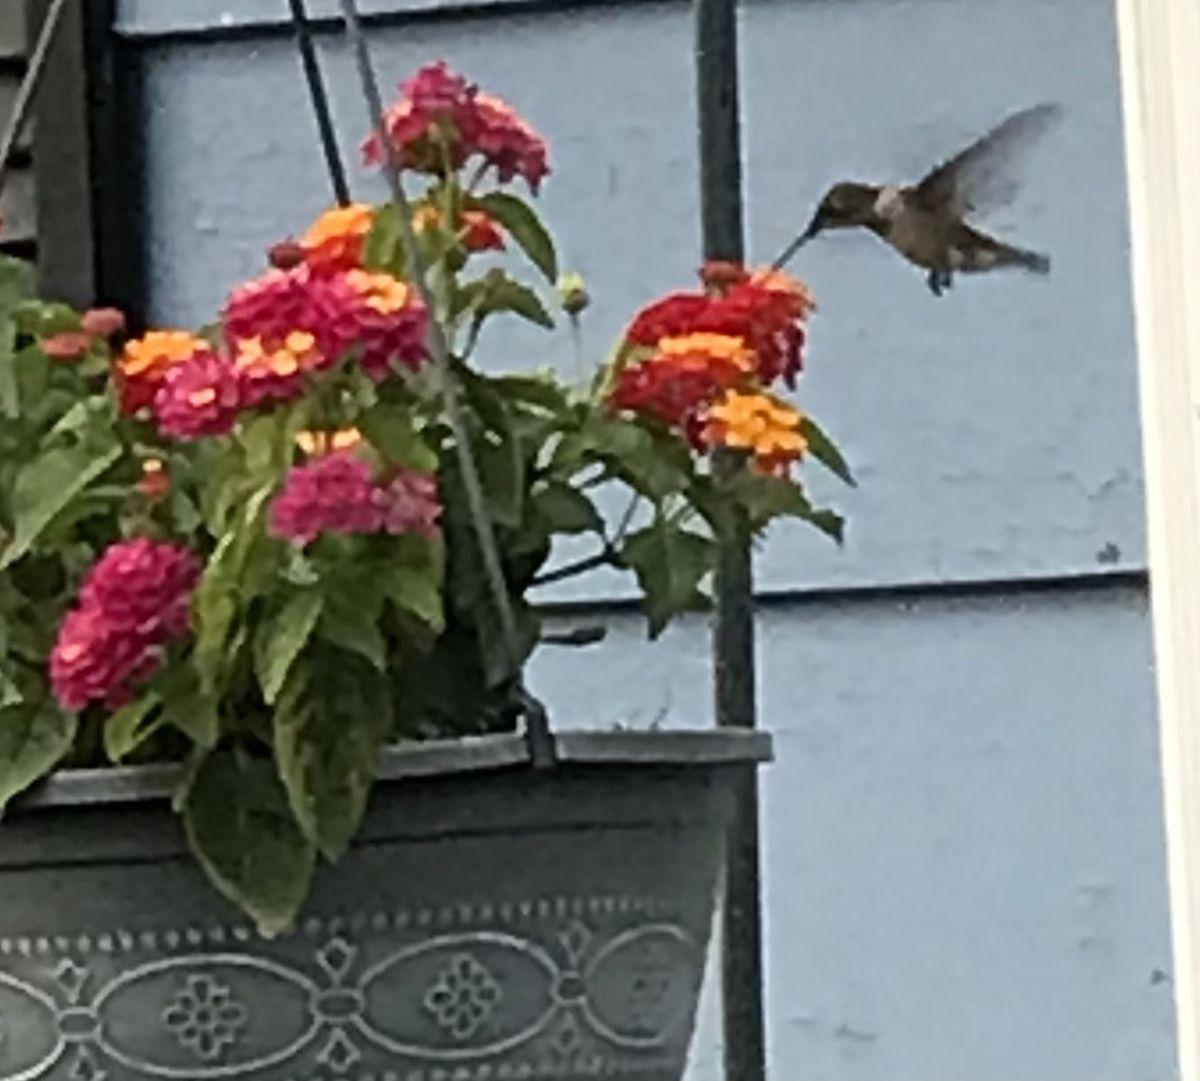 A hummingbird feeding. Credit: Vicky O'Malley